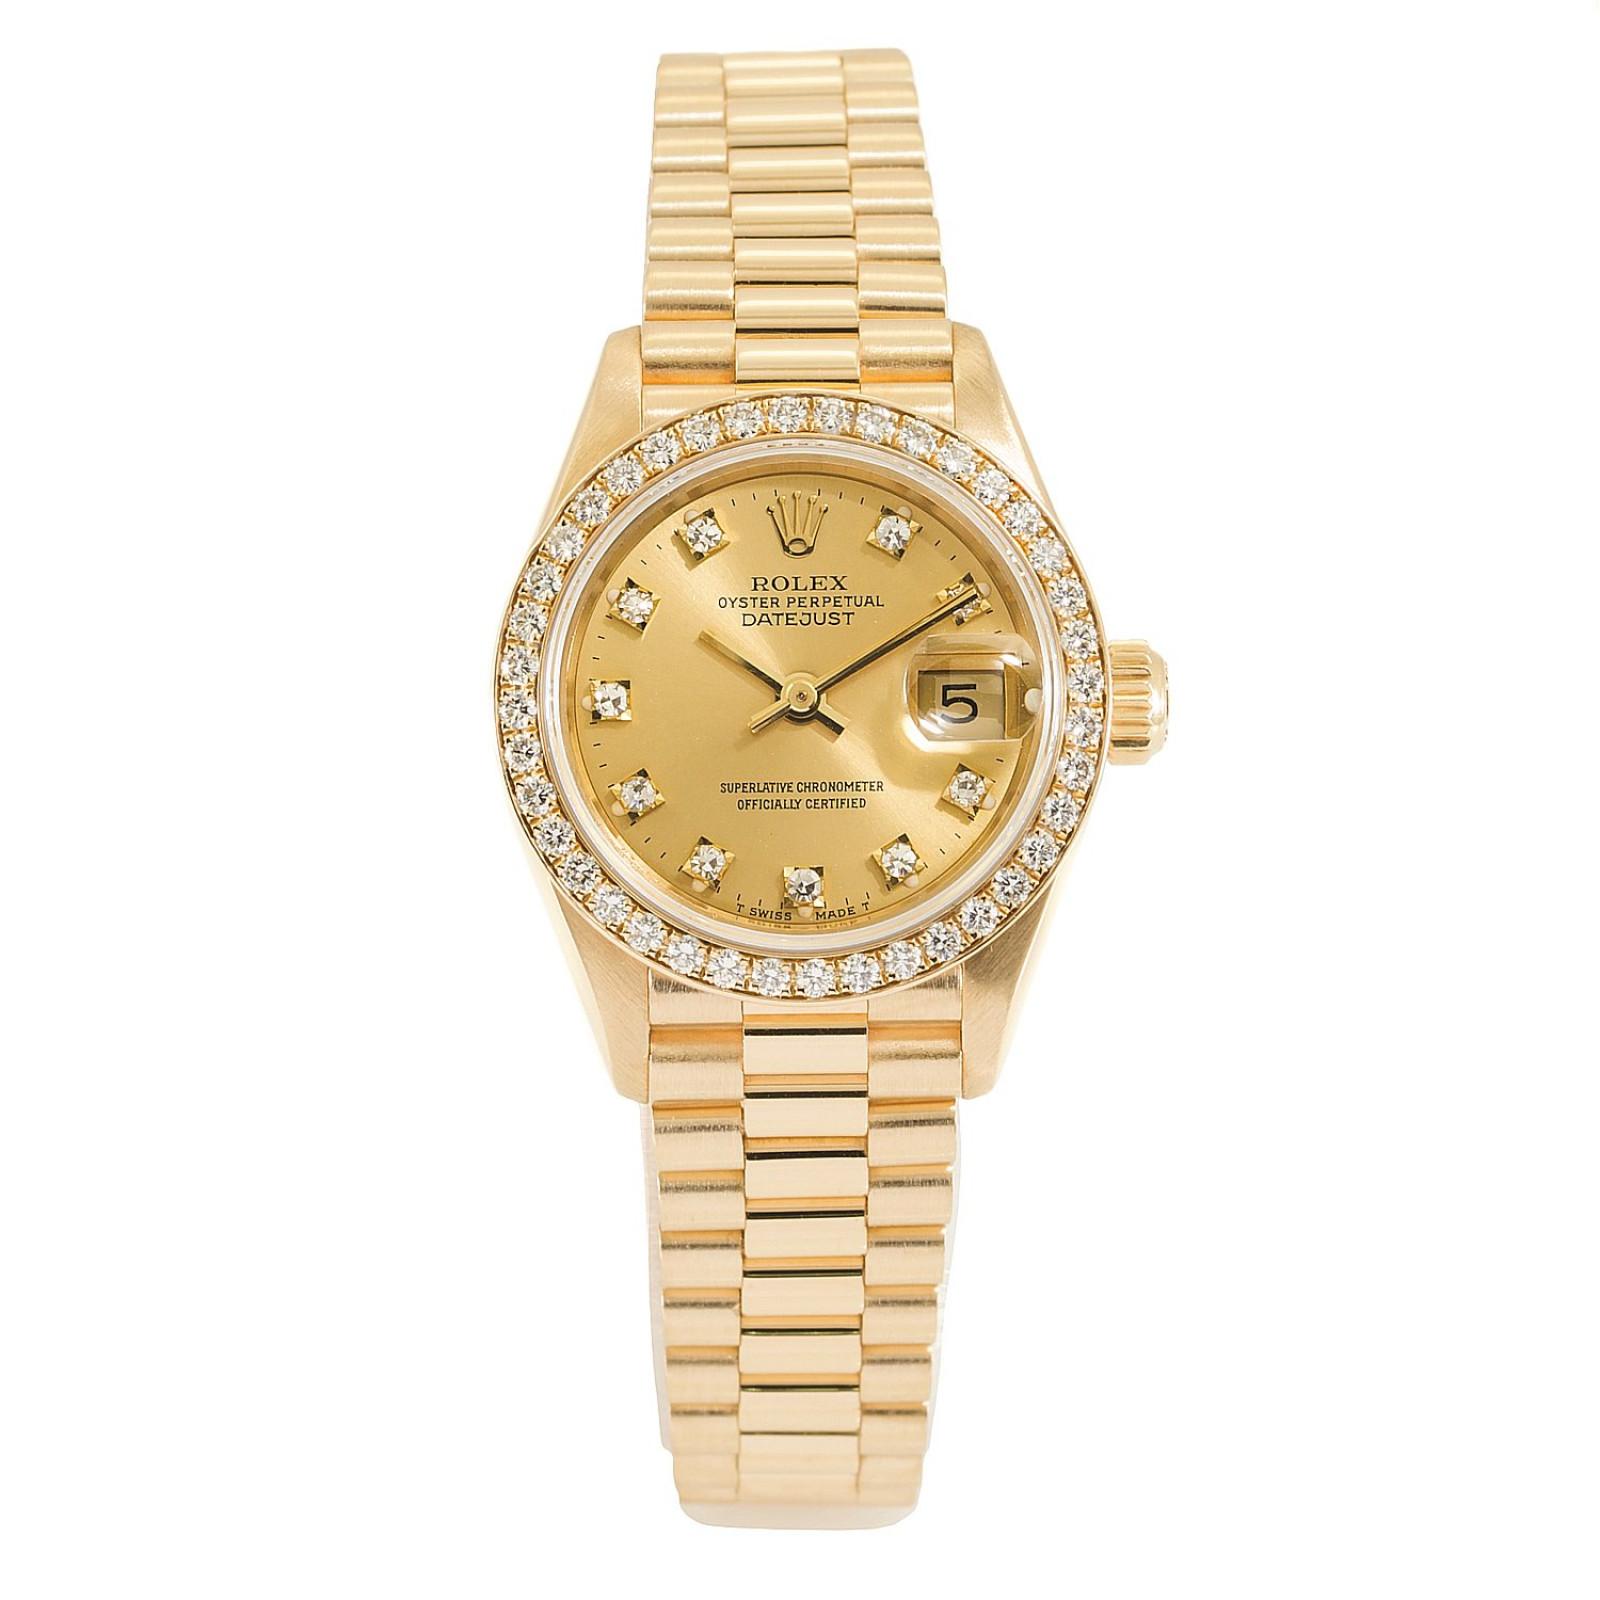 1992 Dimaond Rolex Datejust Ref. 69178